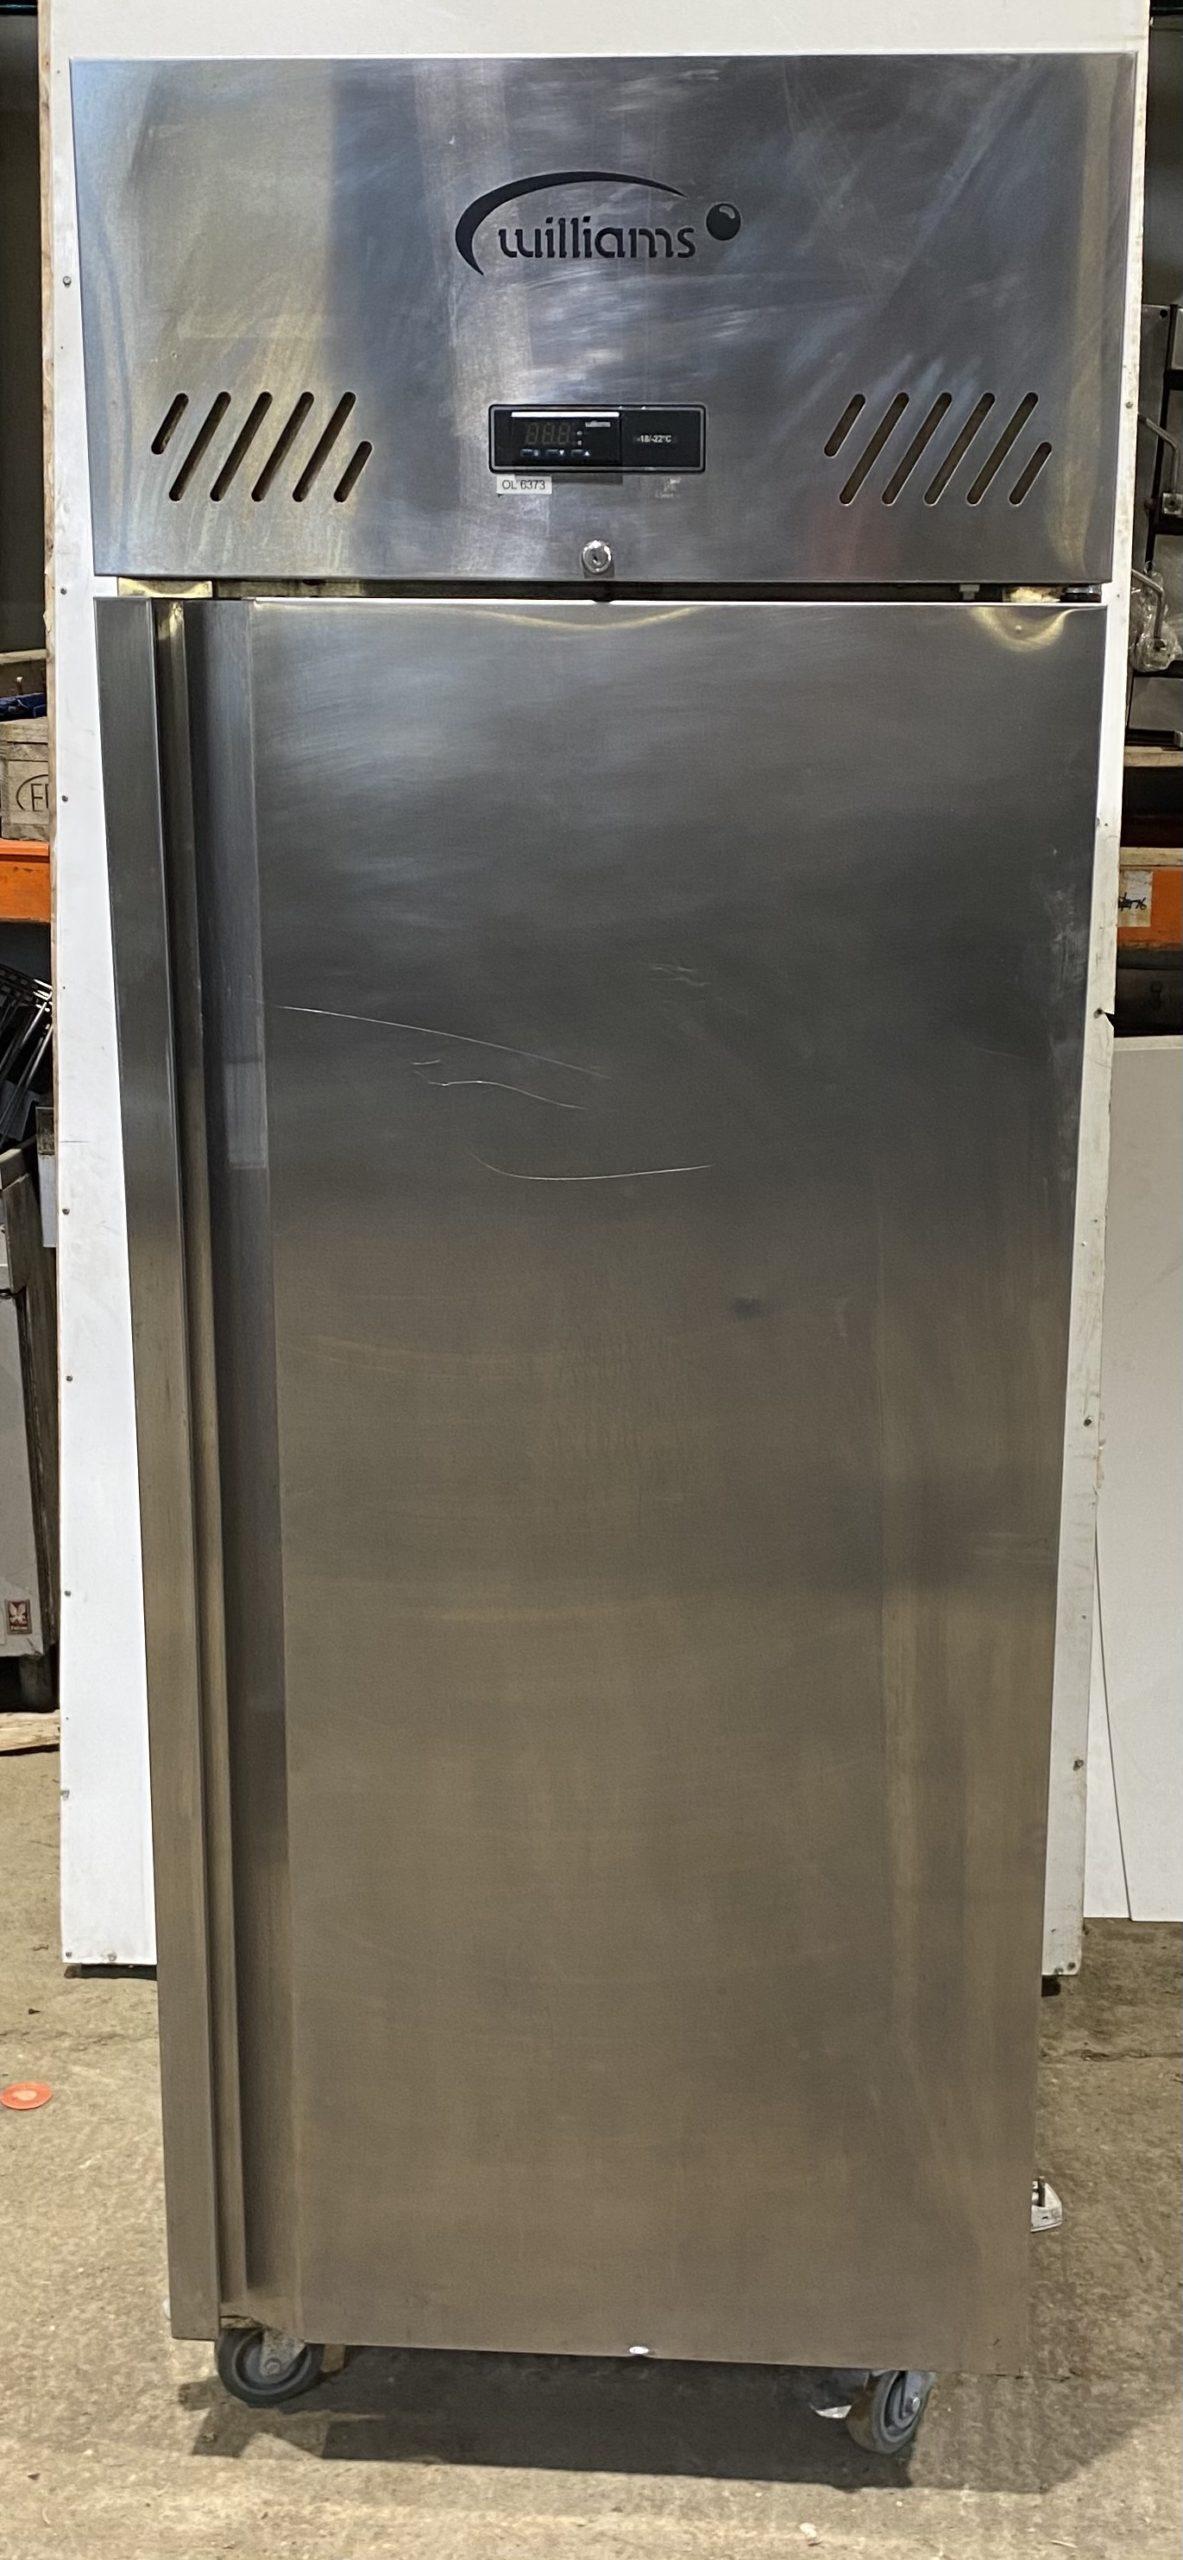 WILLIAMS LJ1-SA Single Door Upright 610 Litre Freezer